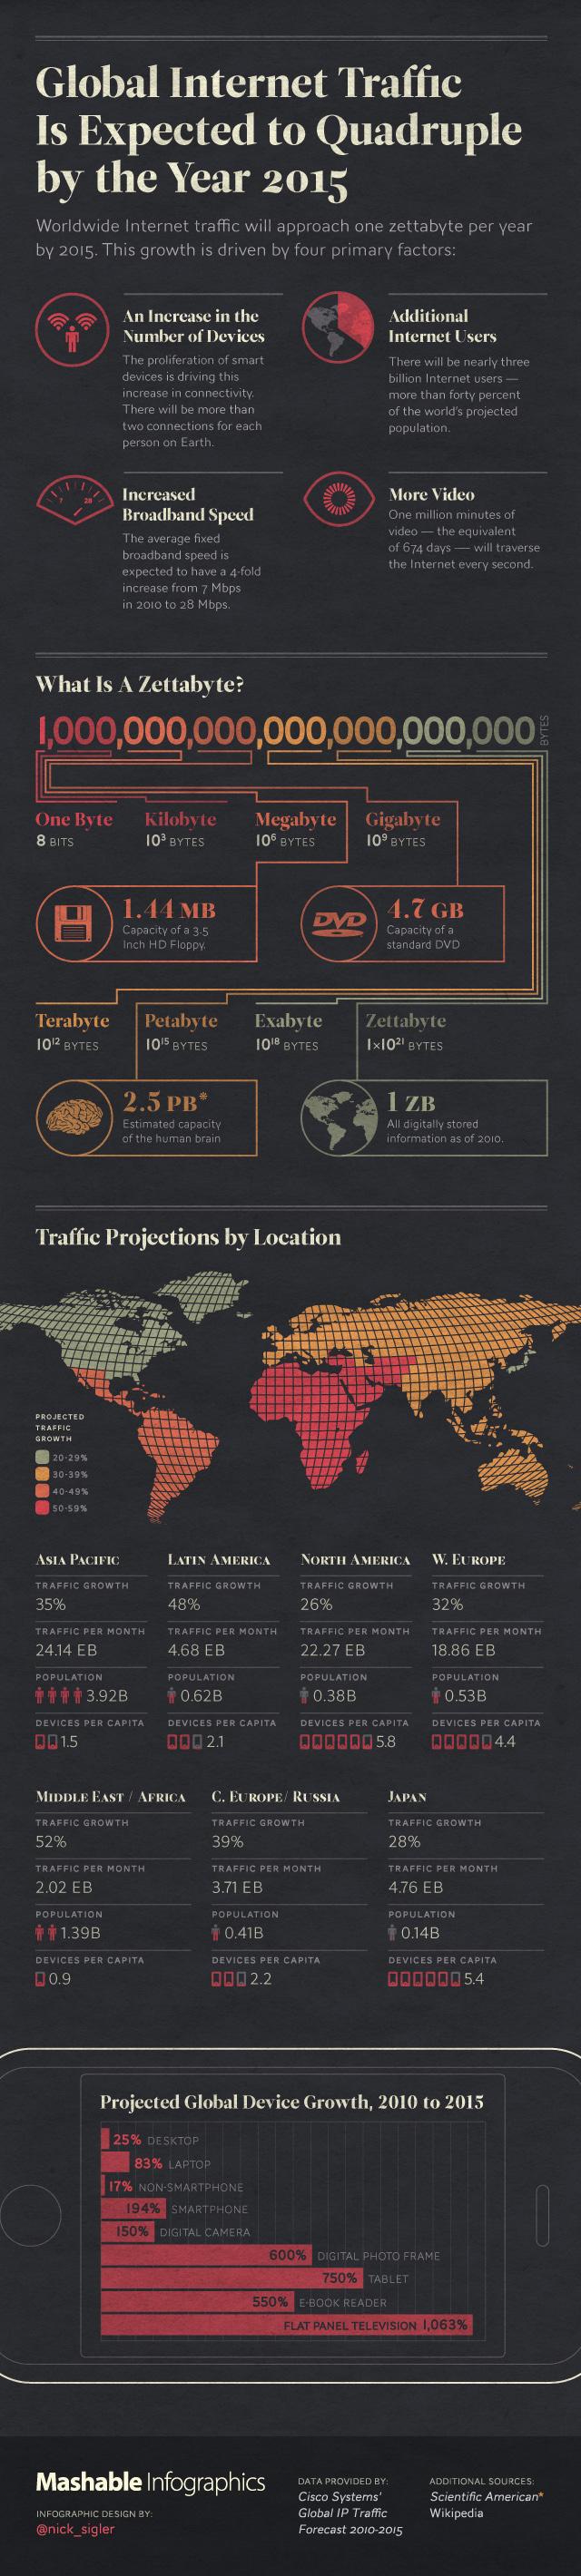 trafico-global-internet-infografia